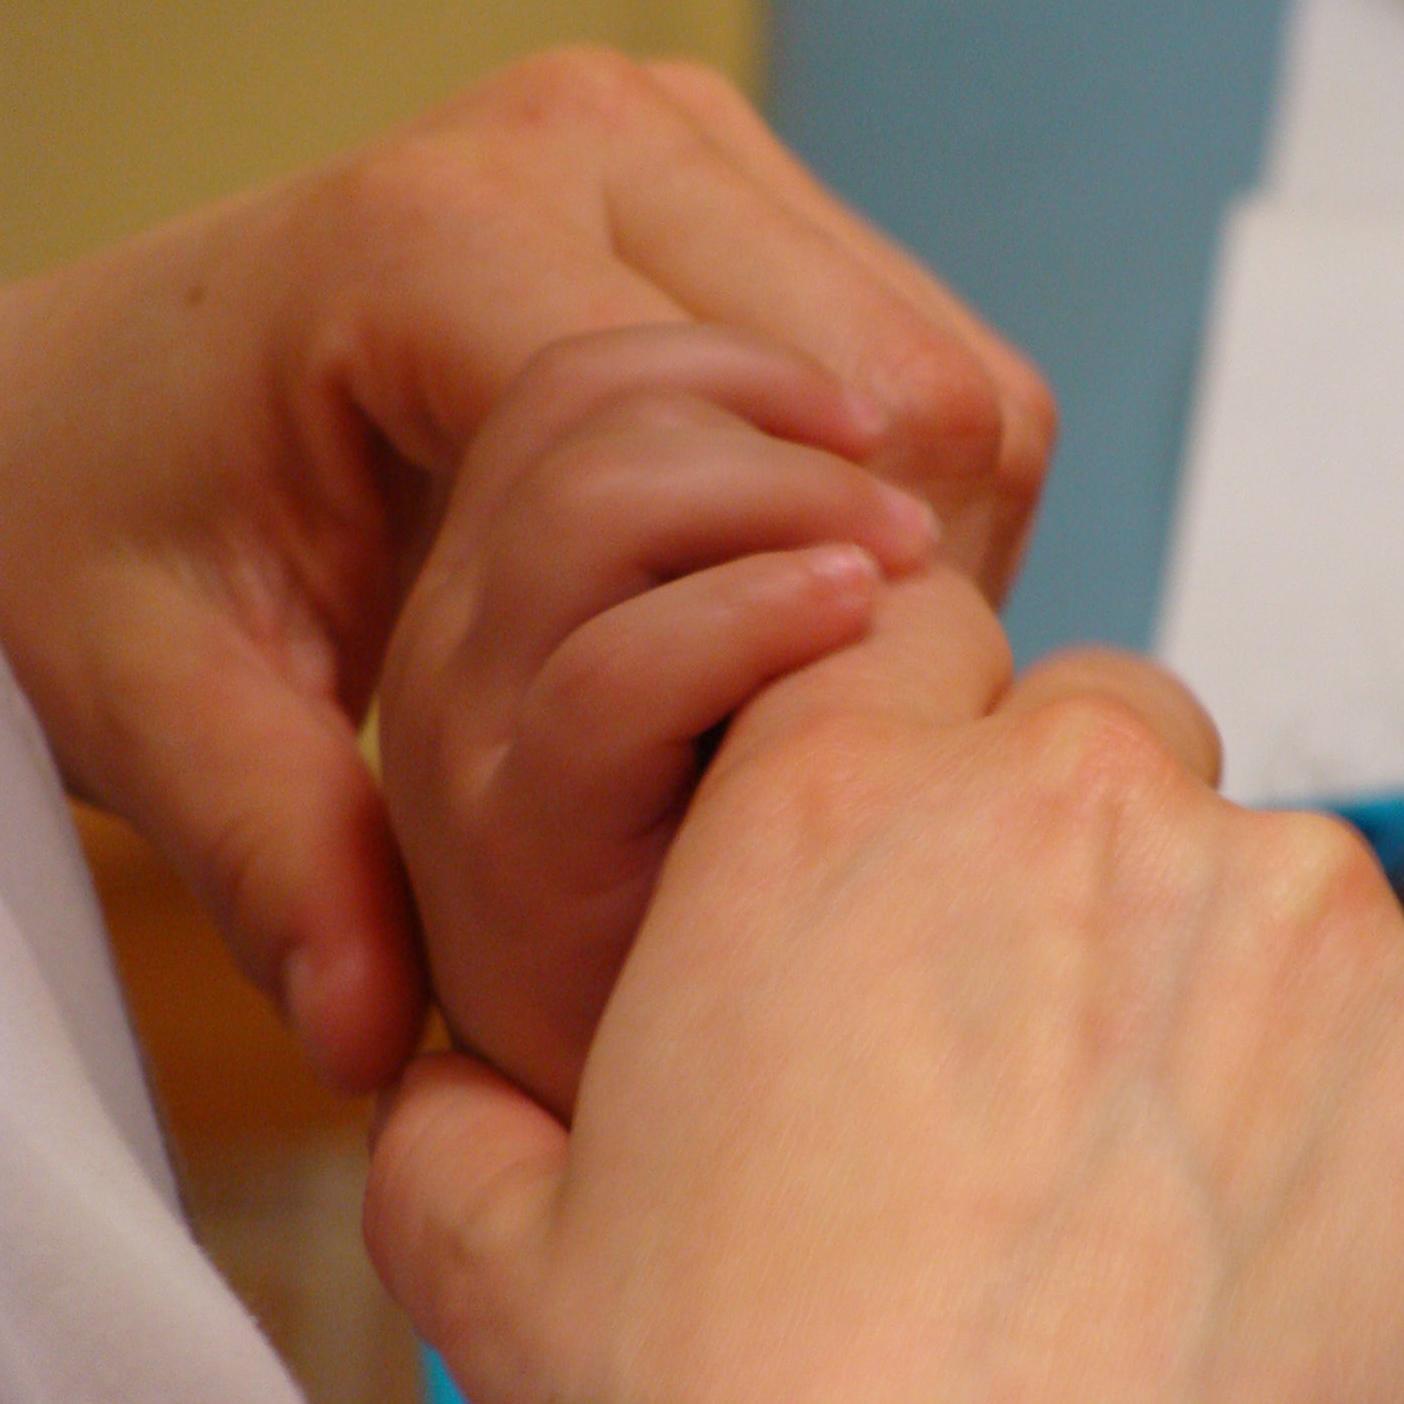 Foto 5 de Fisioterapia en Oleiros | Talus Centro de Fisioterapia y Osteopatía